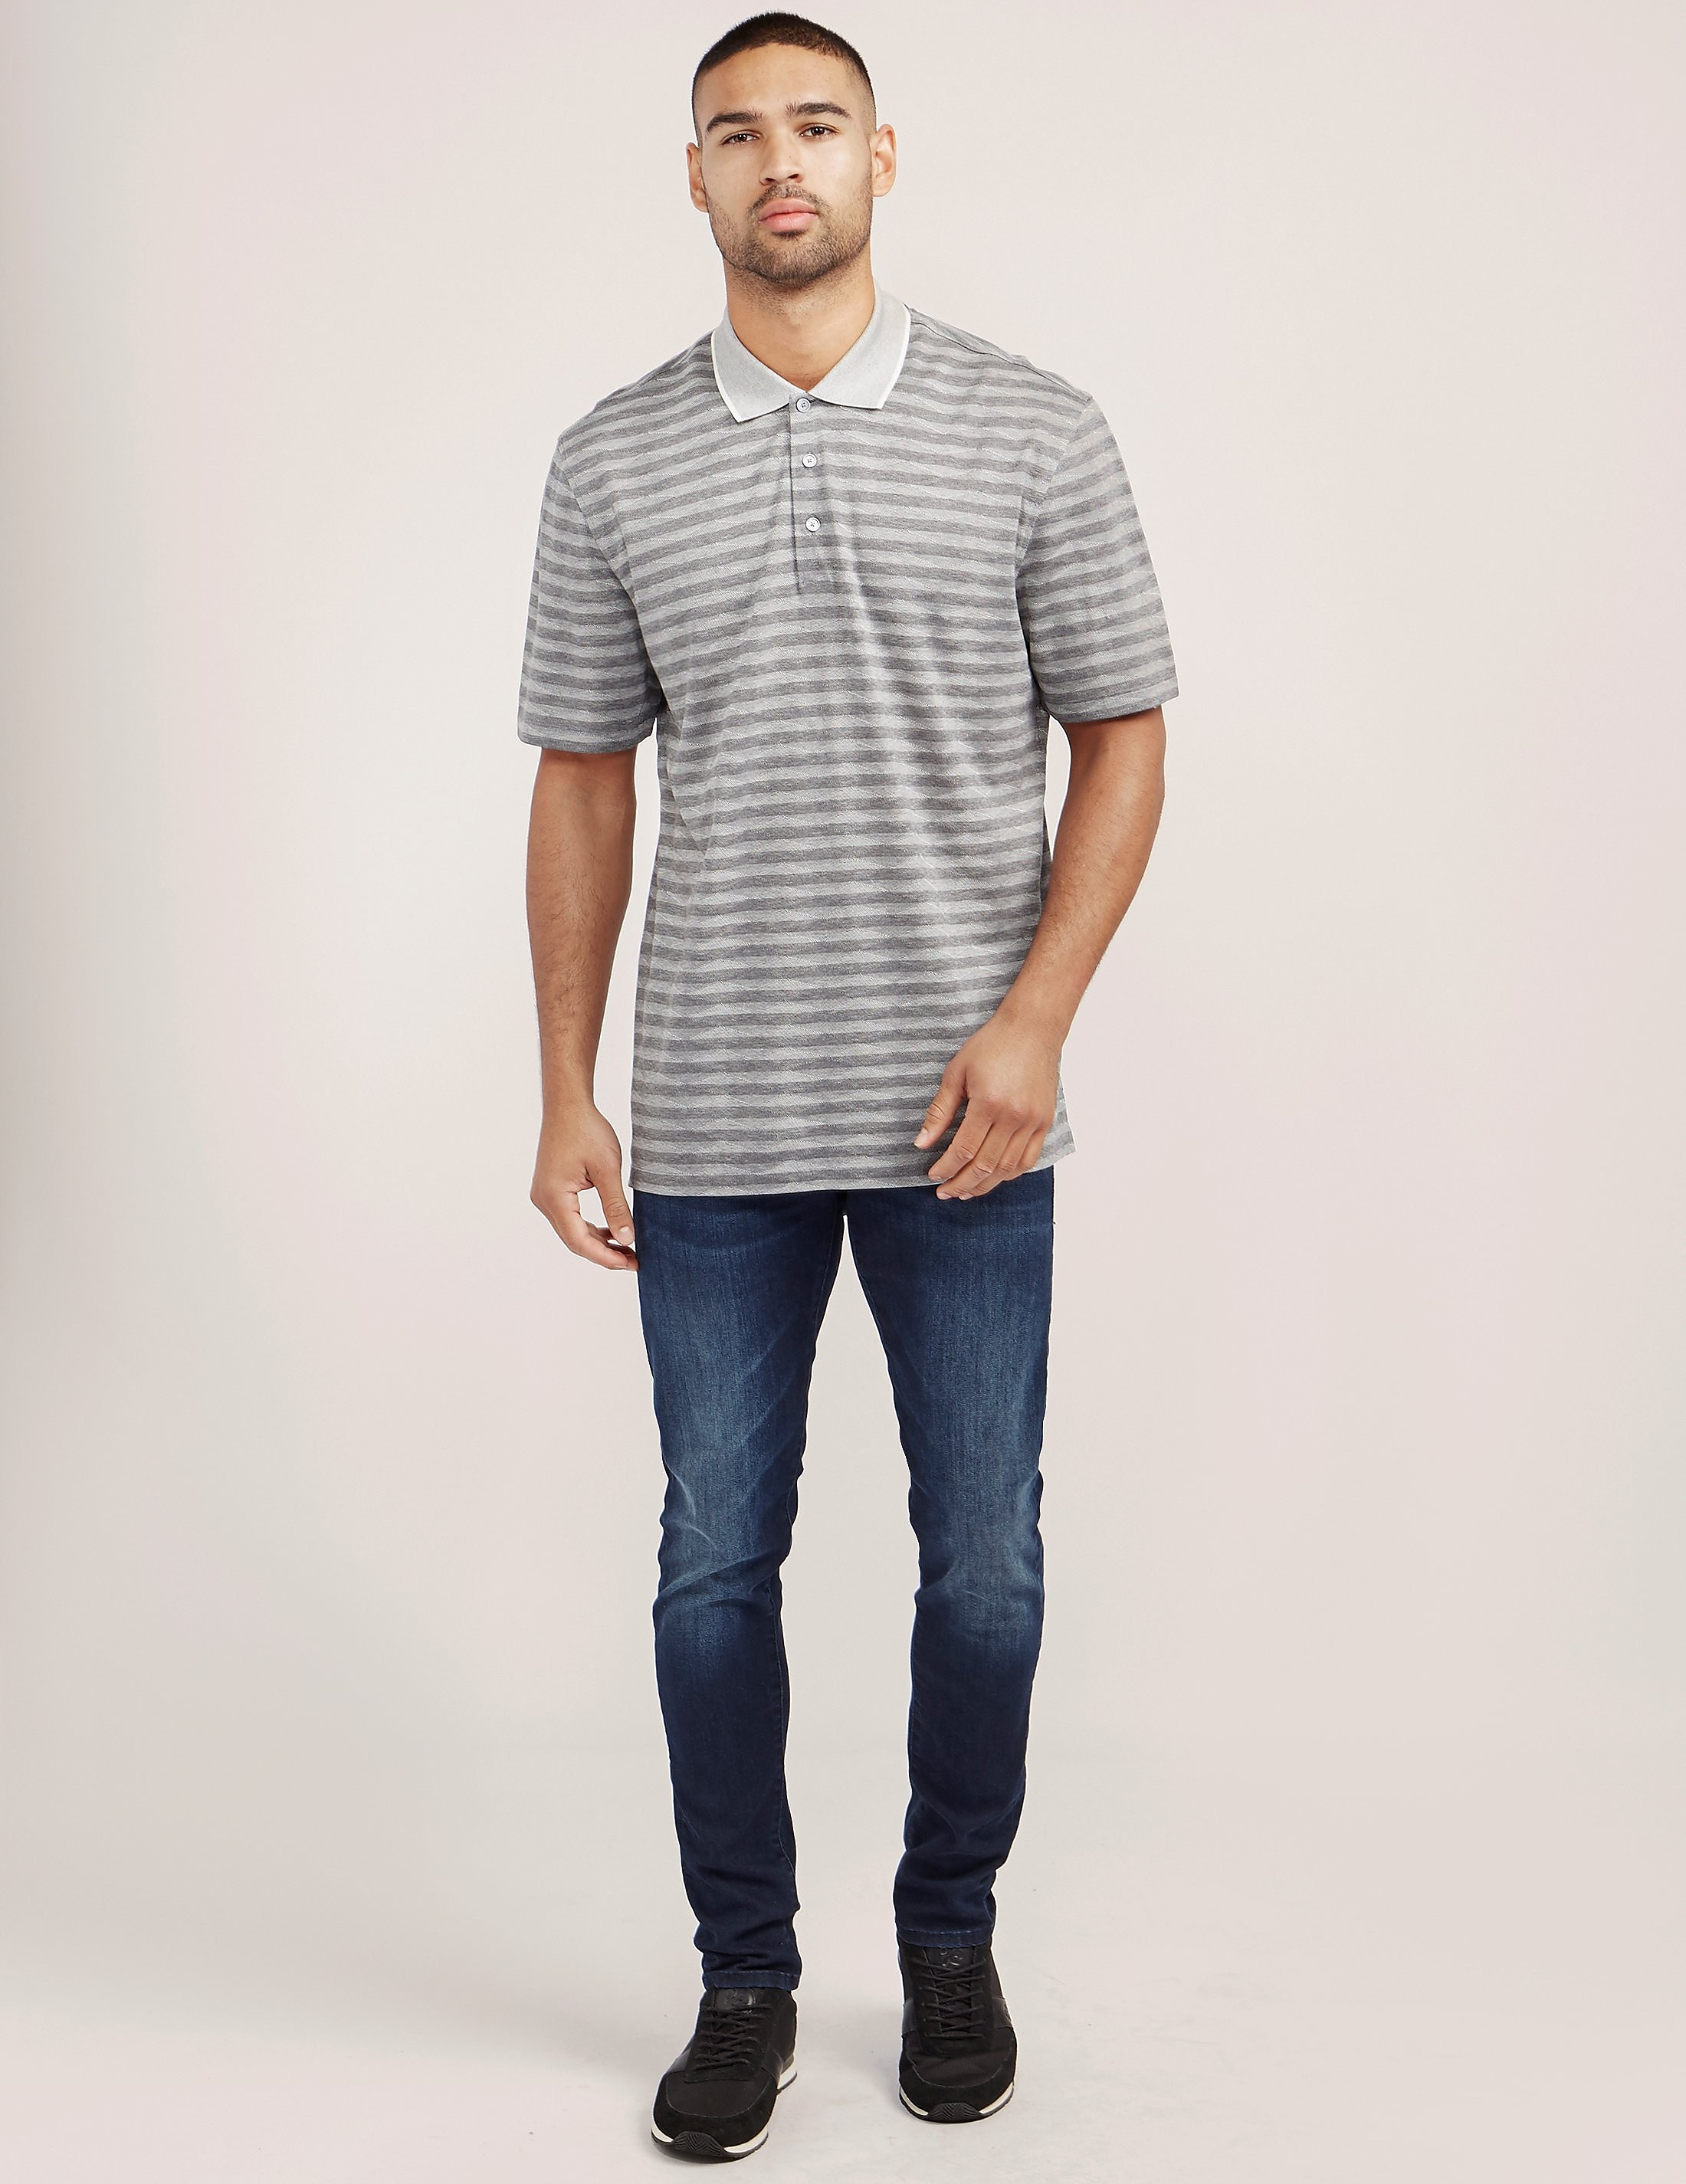 Z Zegna Stripe Short Sleeve Polo